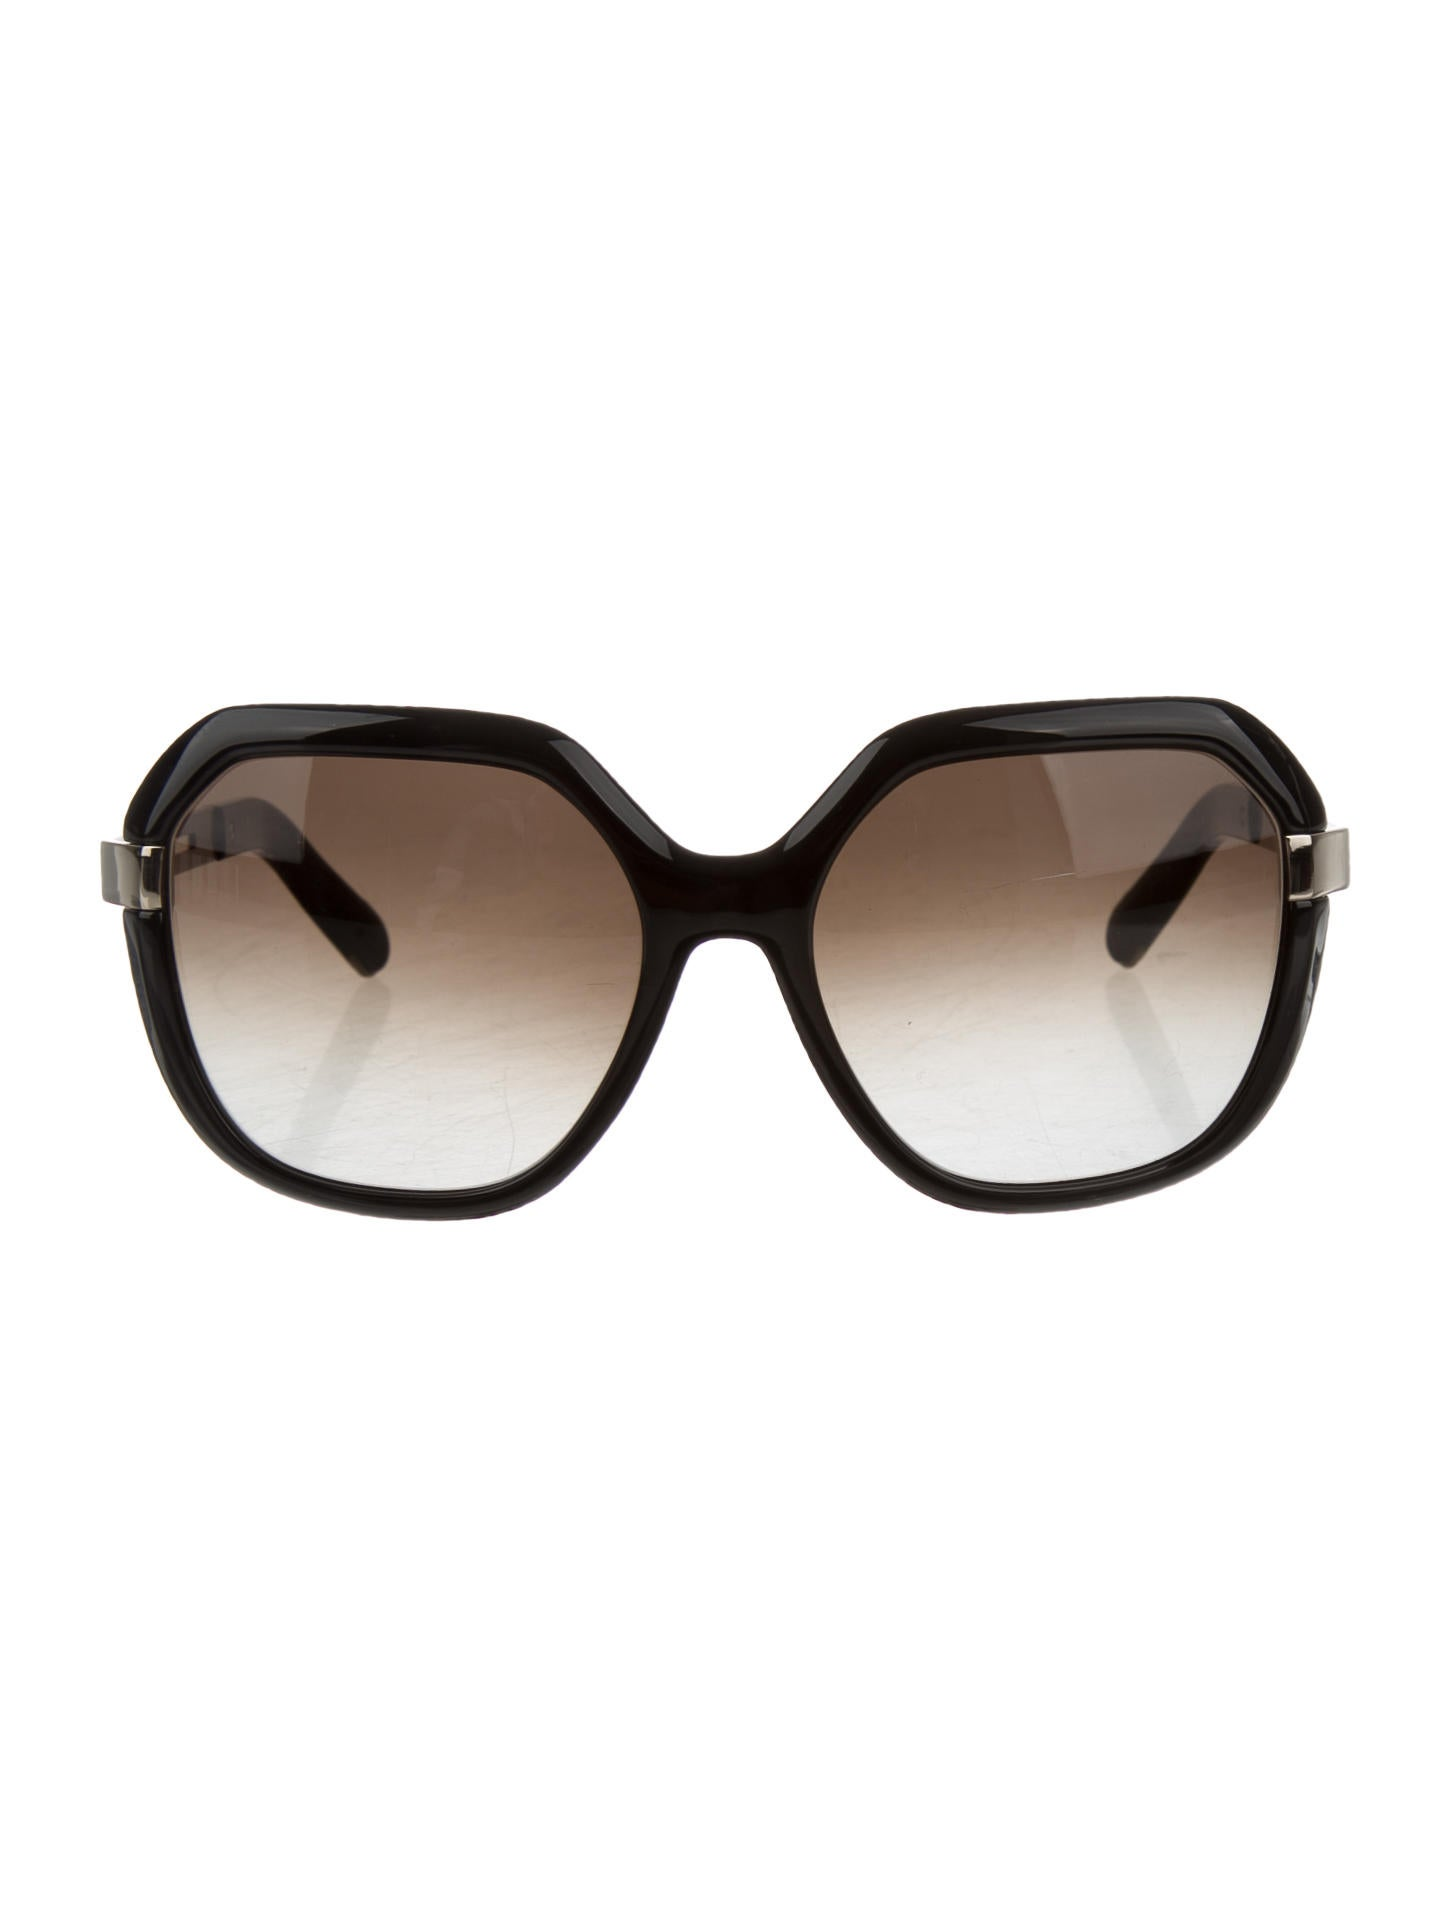 4a380b1ee768 Chloe Cl2252 Sunglasses For Women